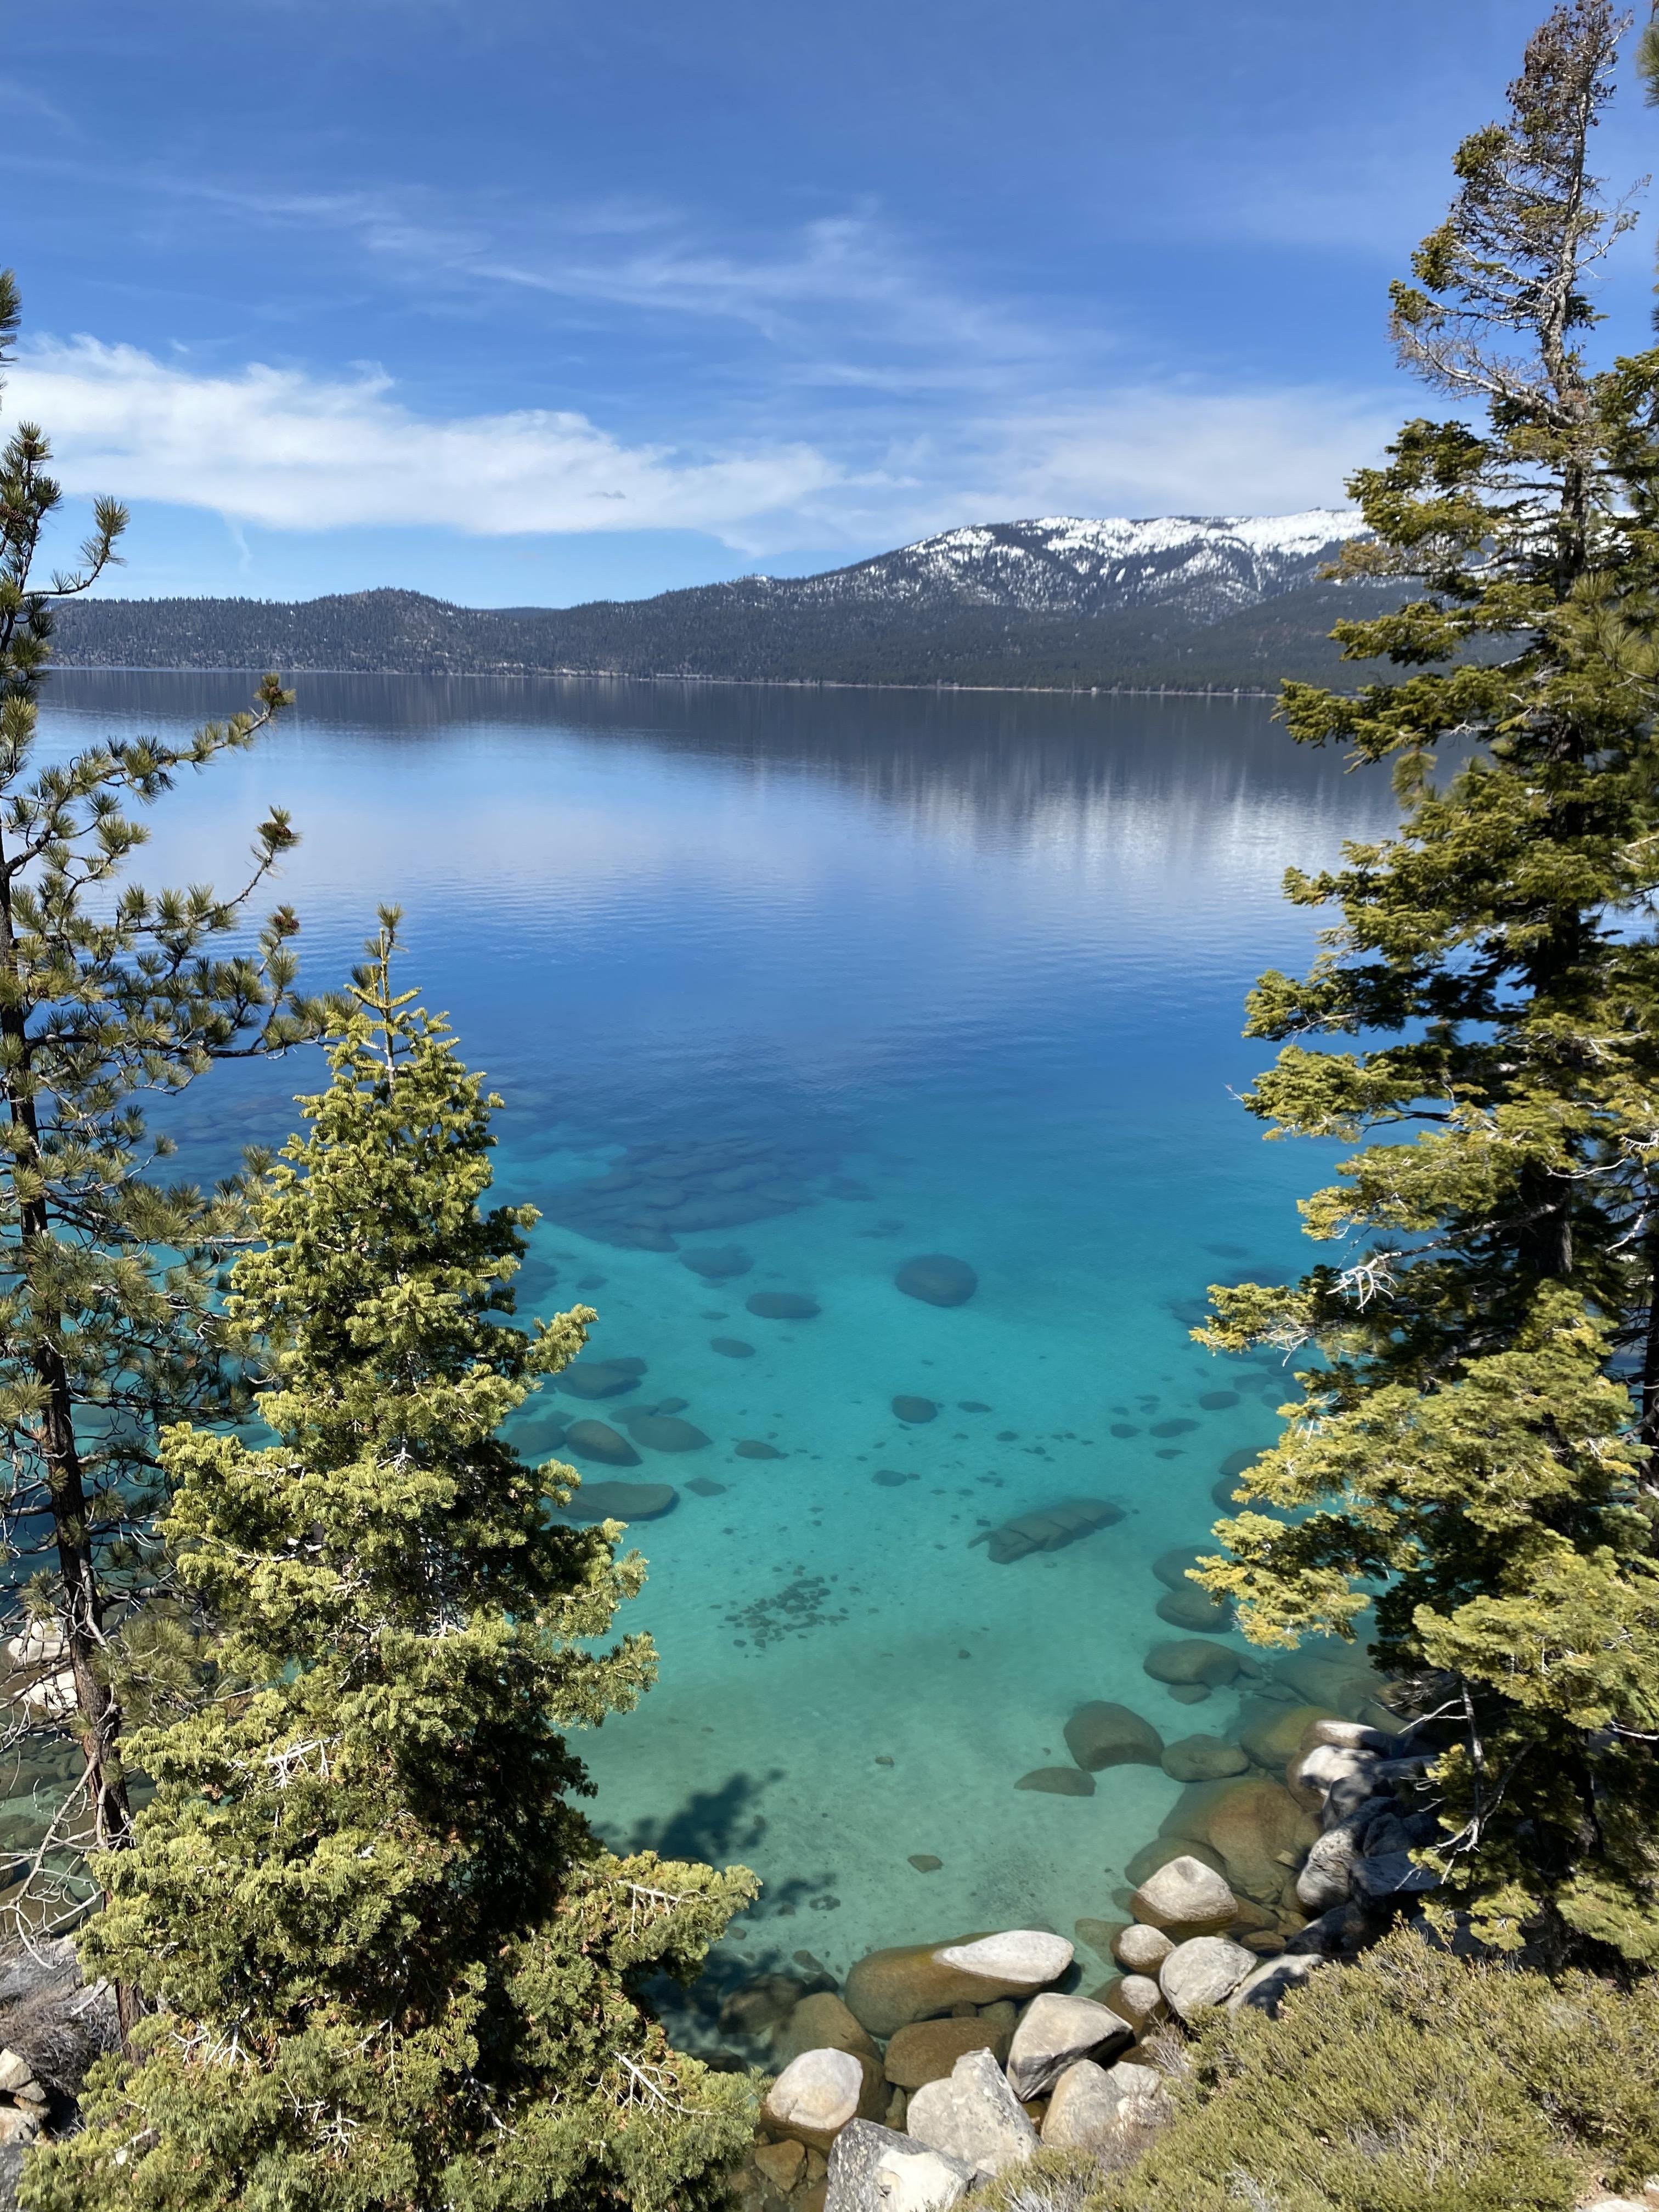 Lake Tahoe Nevada Oc 2688x1242 Landscapes Nature Beauty Photography Travel In 2020 Lake Tahoe Nevada Landscape Photography Lake Tahoe